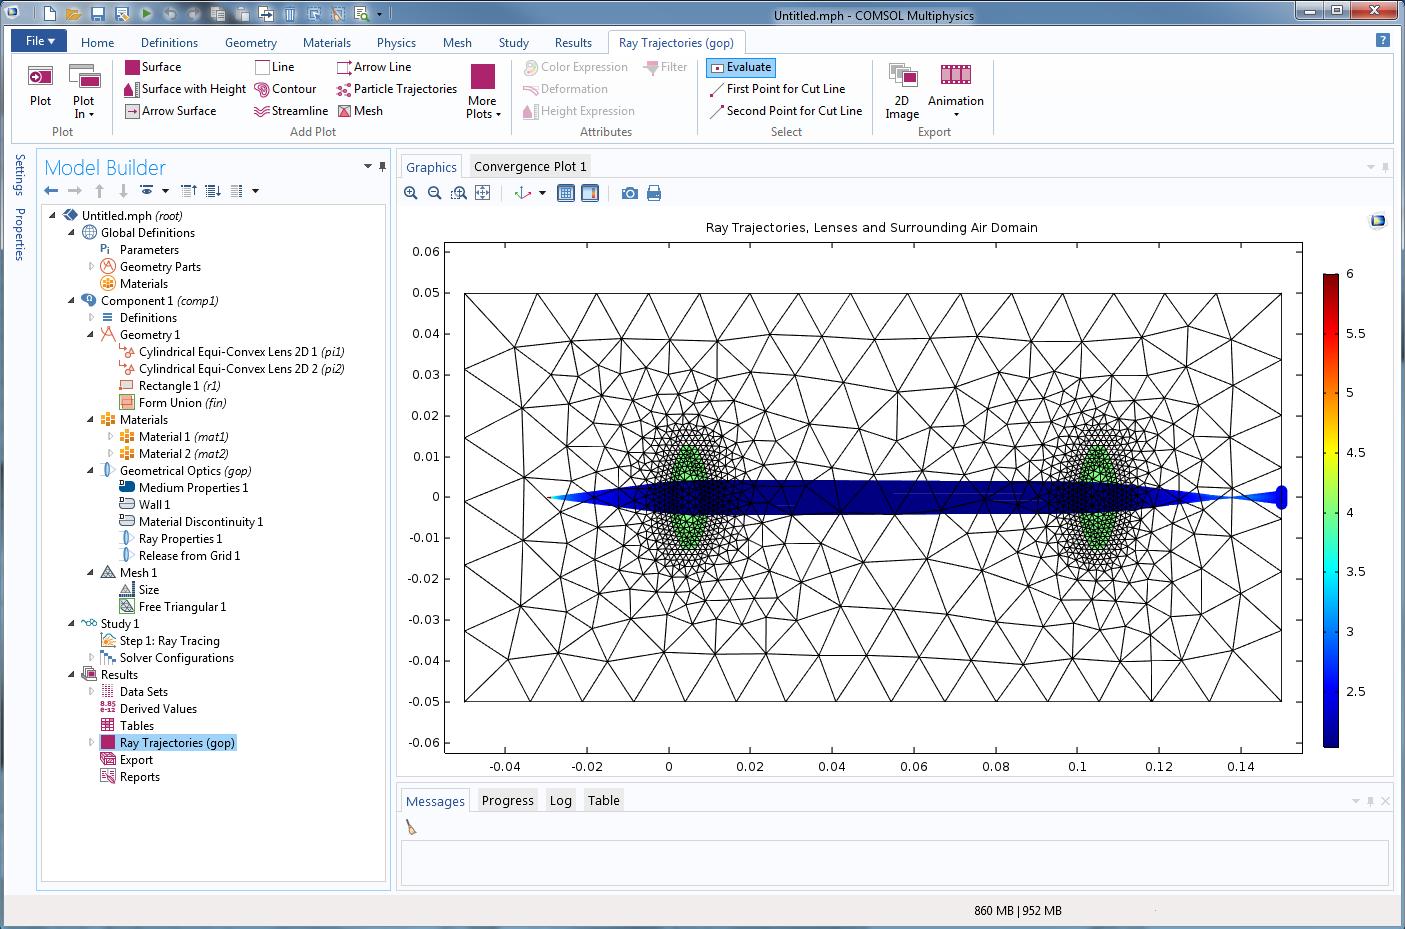 COMSOL Multiphysics 5.2 版本中模拟的射线光学透镜系统。